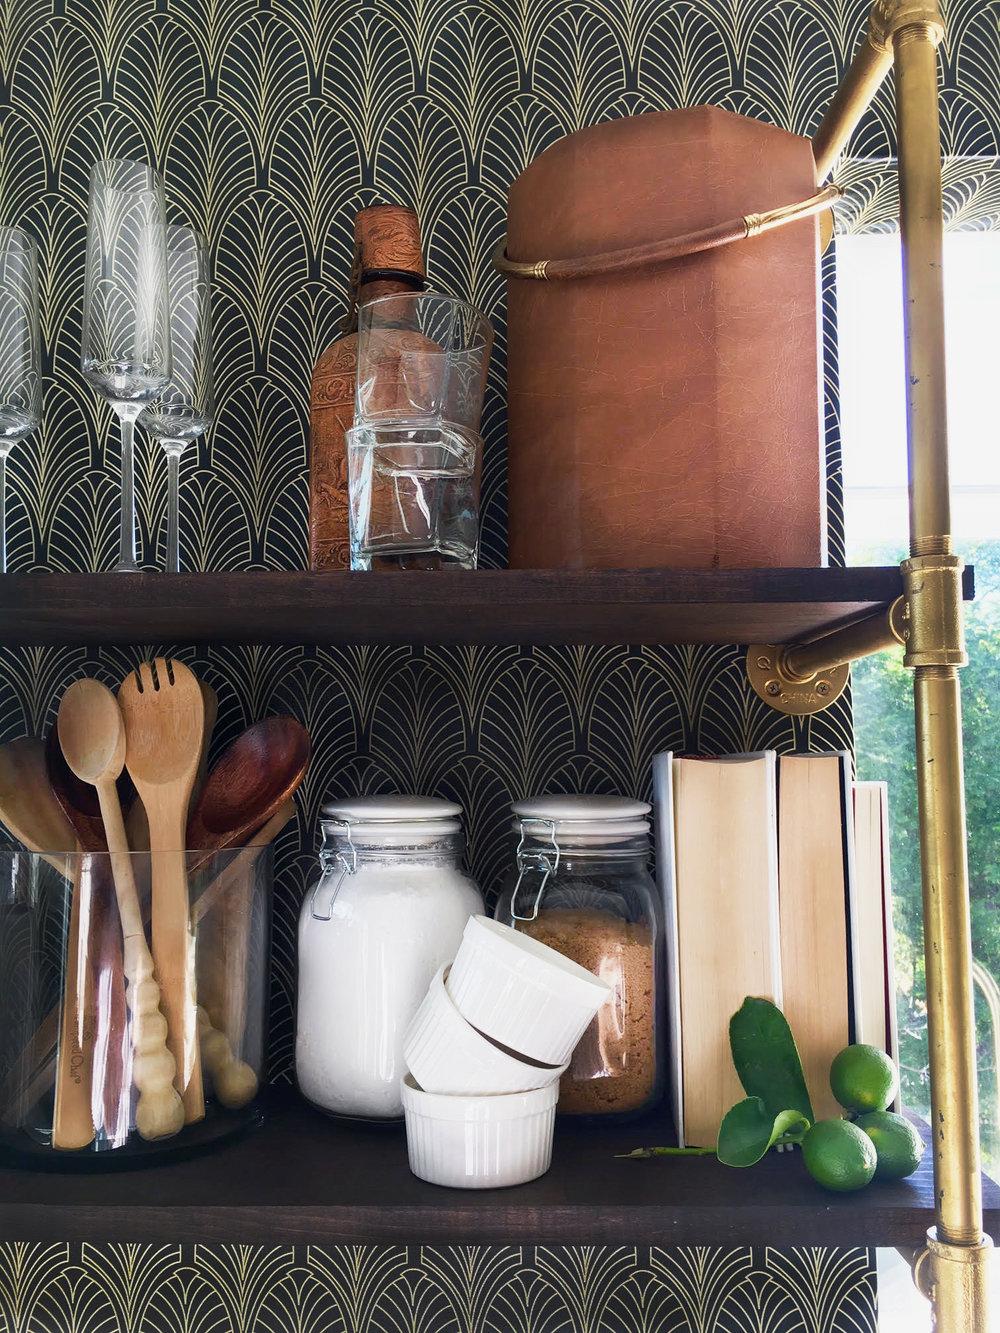 burton-kitchen-close-up-shelves.jpg